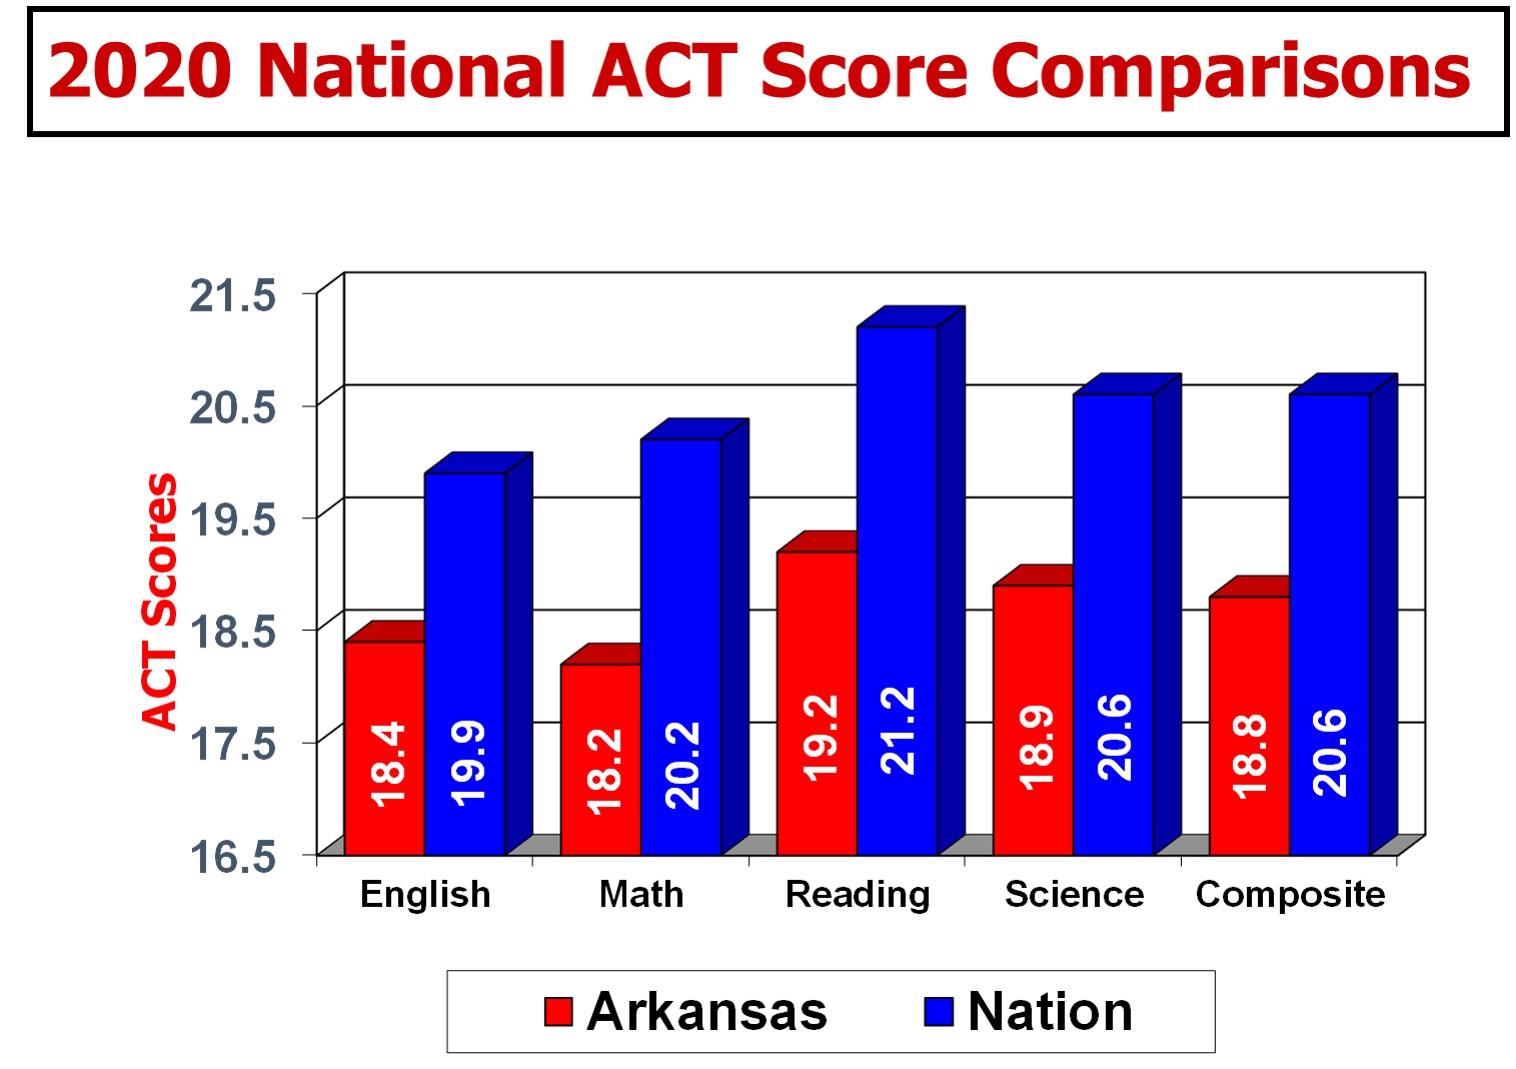 2019 National ACT Score Comparisons